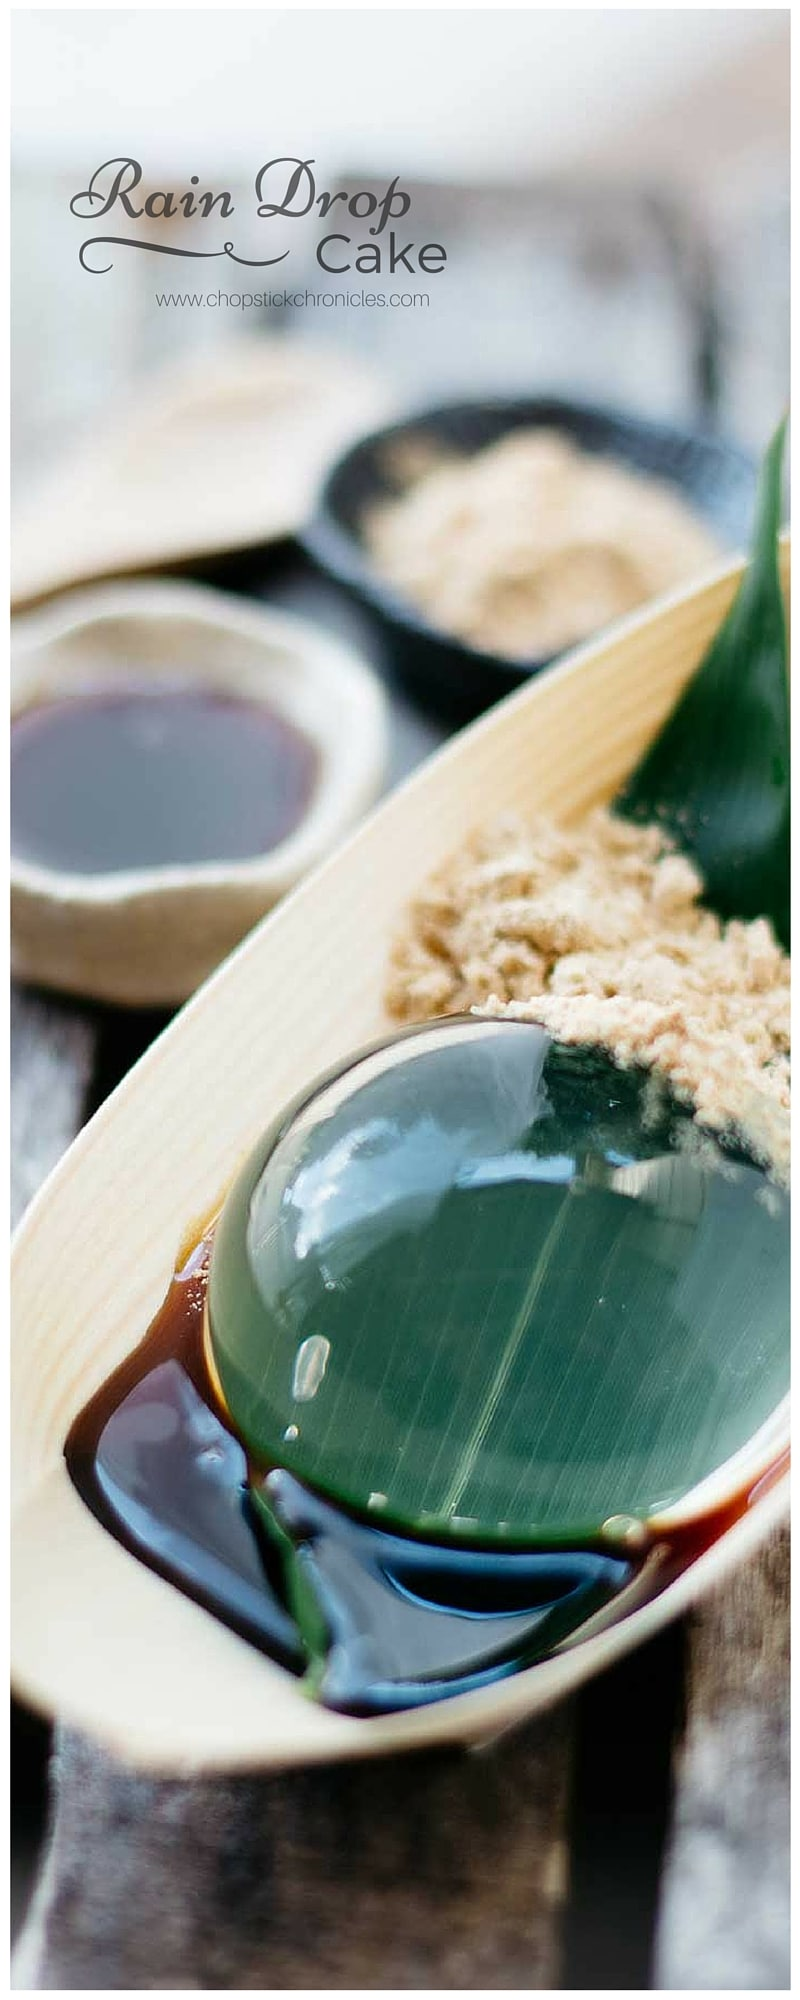 Raindrop Cake - make crystal clear raindrop | Chopstick